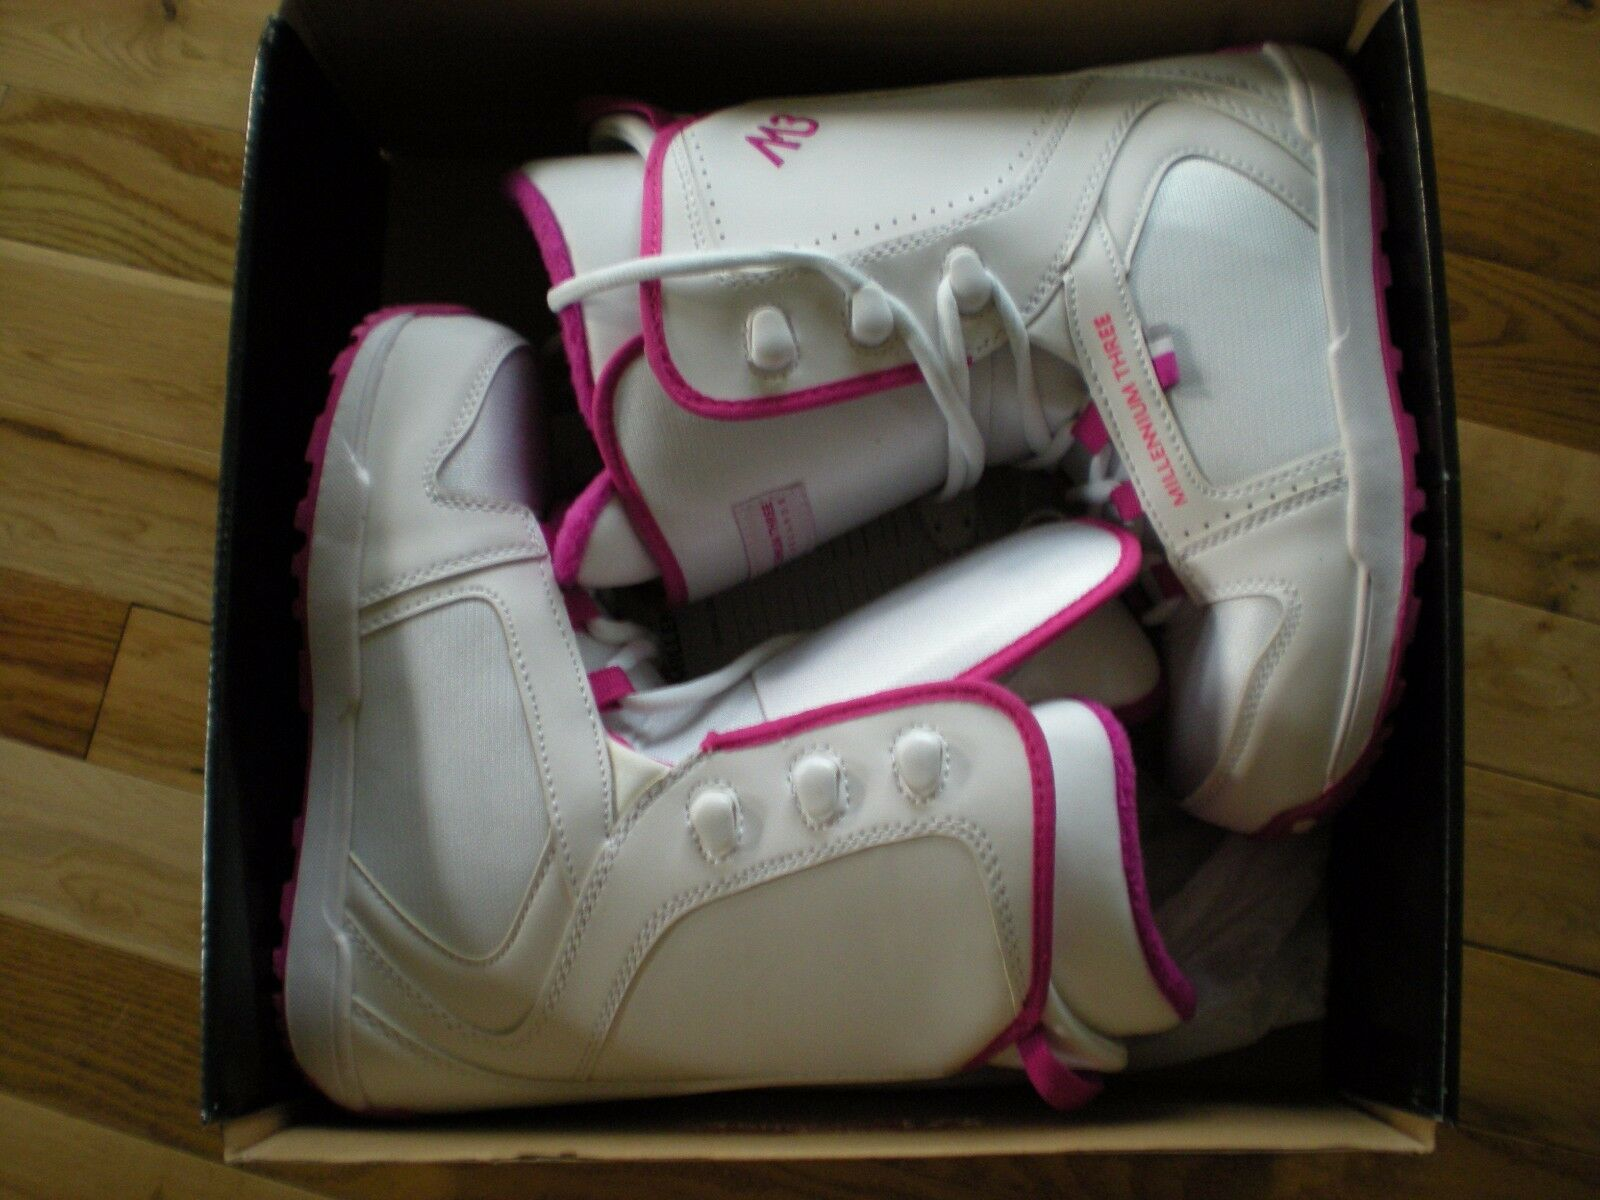 damen MILLENNIUM THREE VENUS SNOWBOARD Stiefel, NEW, U.S. Größe 7 NEW IN BOX